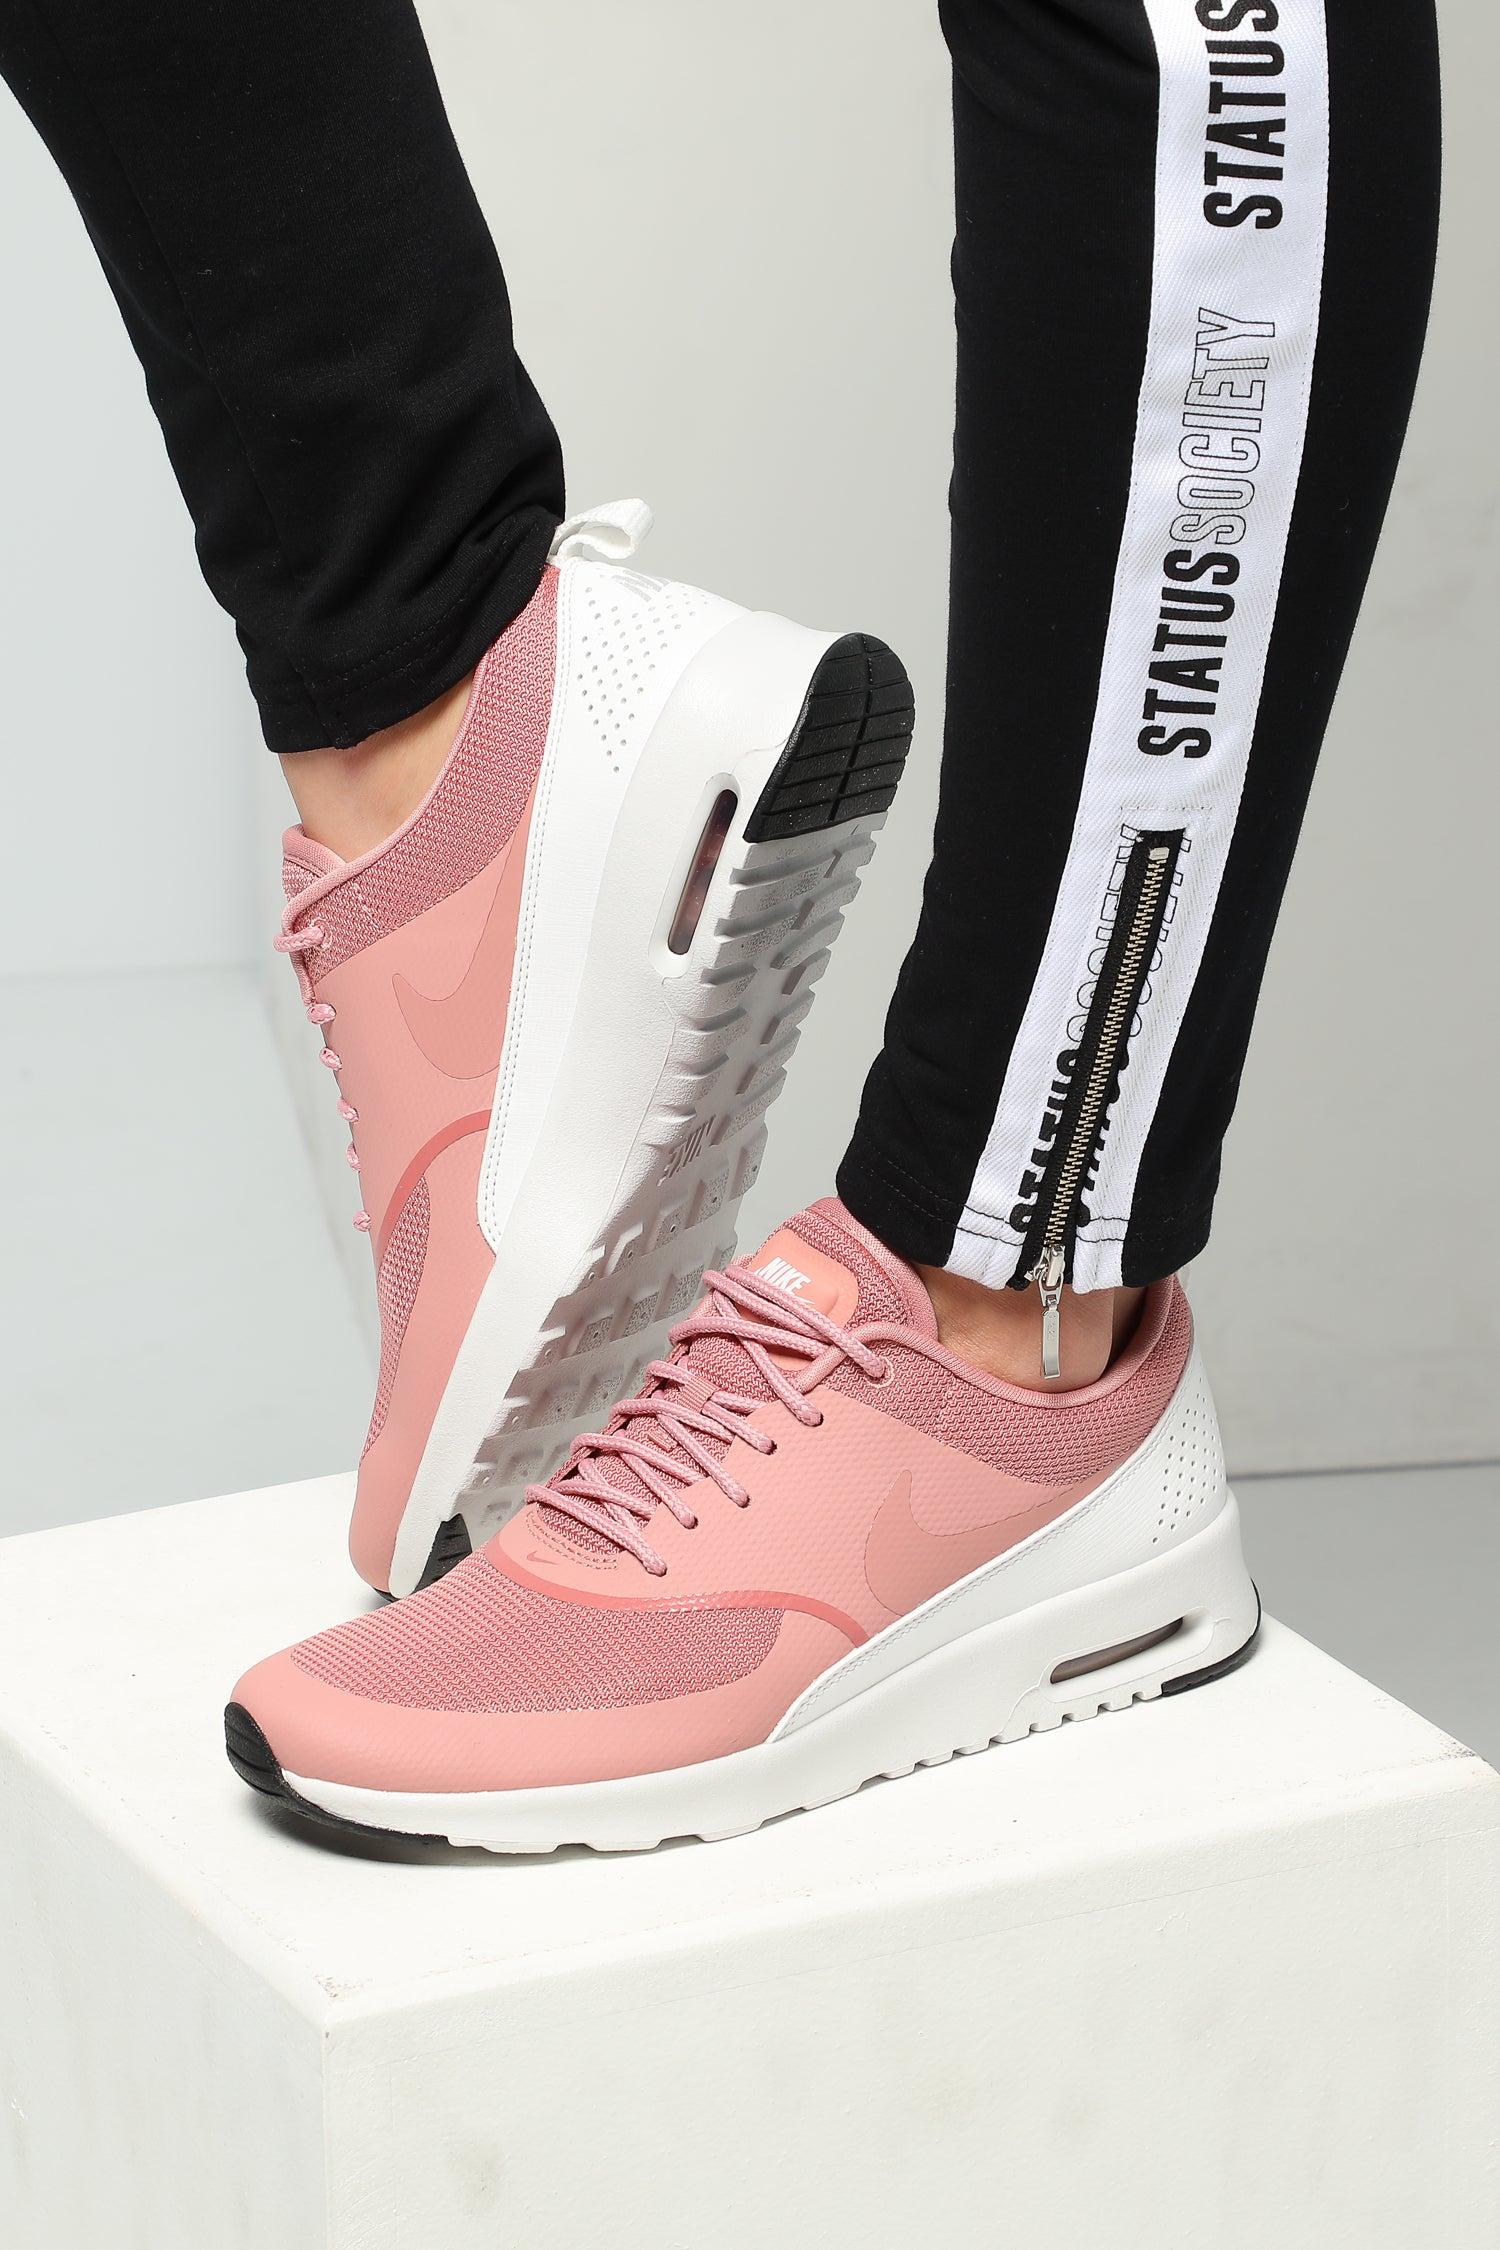 Nike Women's Air Max Thea Pink/White